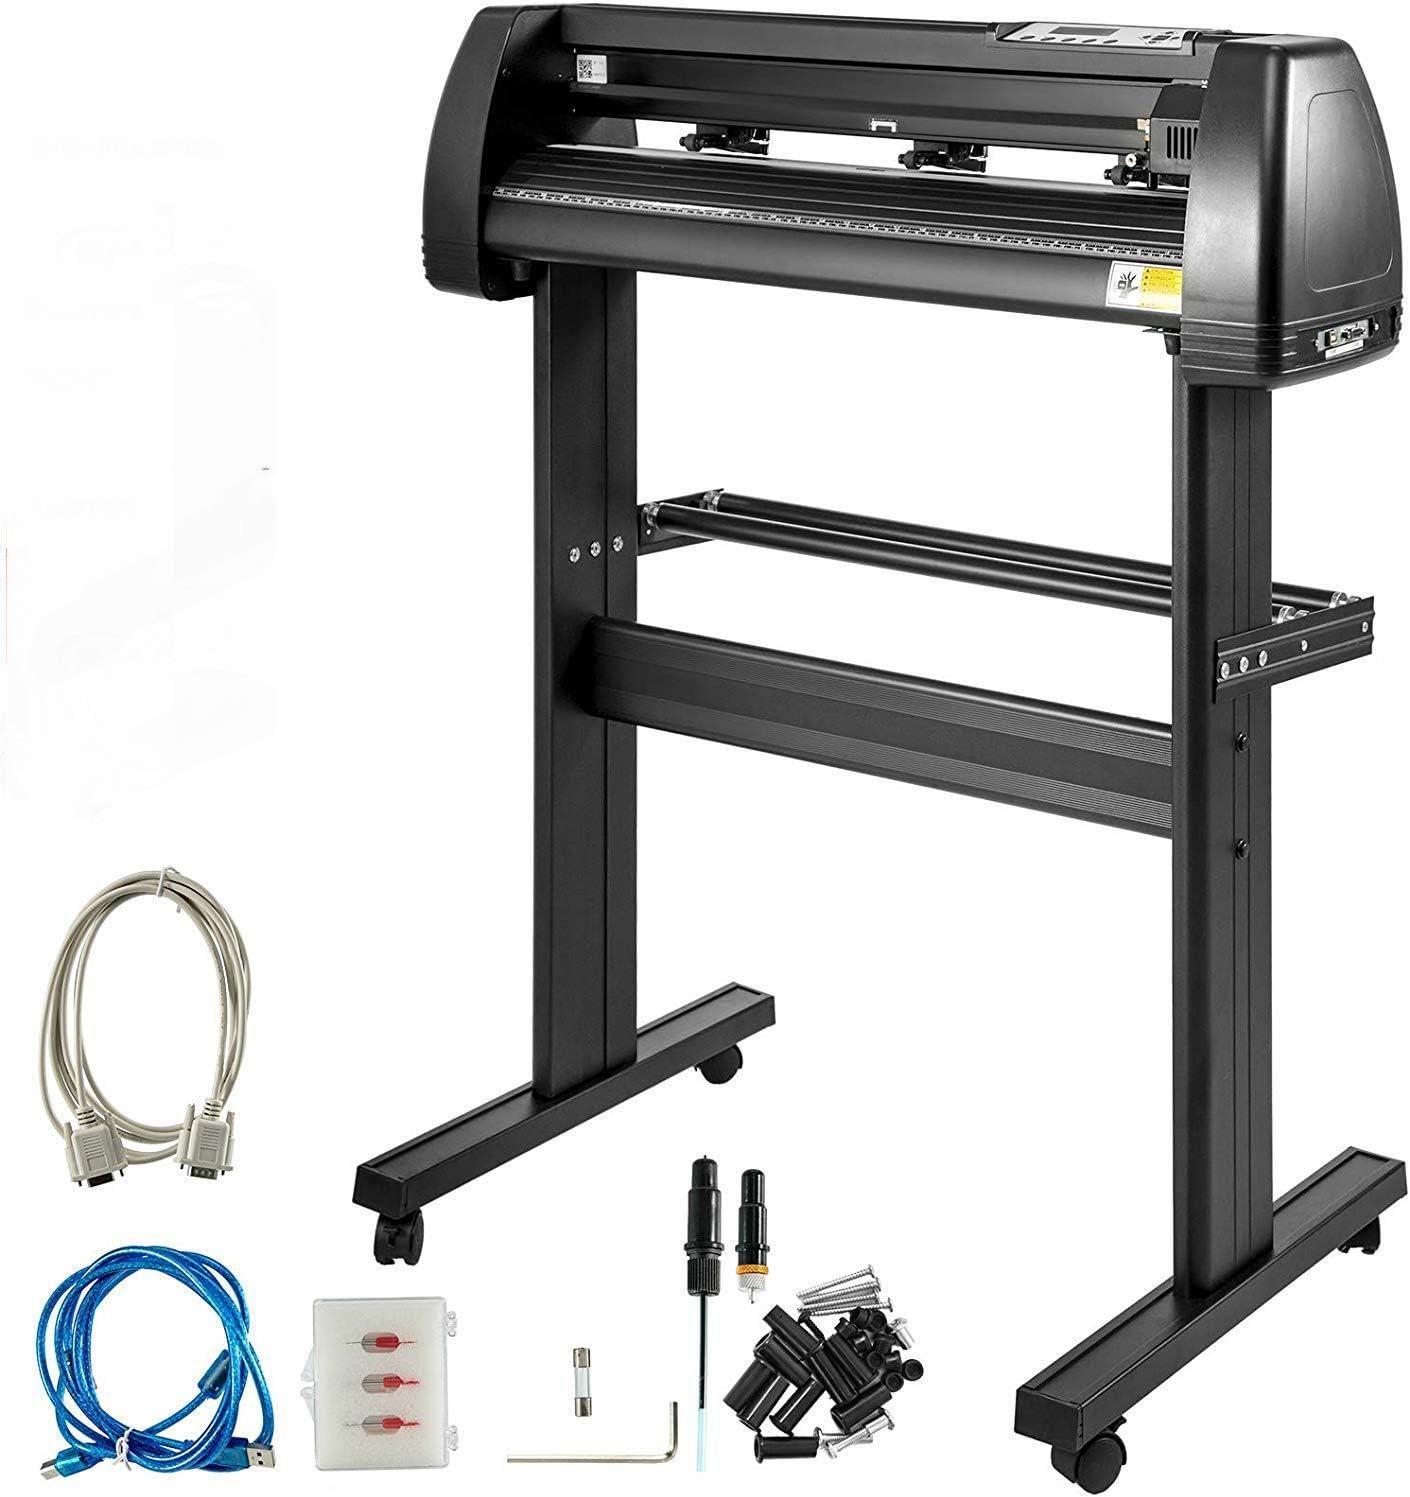 SHIJING Plotter Plotter de Corte 28 Pulgadas Stent Registro 720 mm Software de la máquina Plotter Plotter máquina de Hacer: Amazon.es: Deportes y aire libre